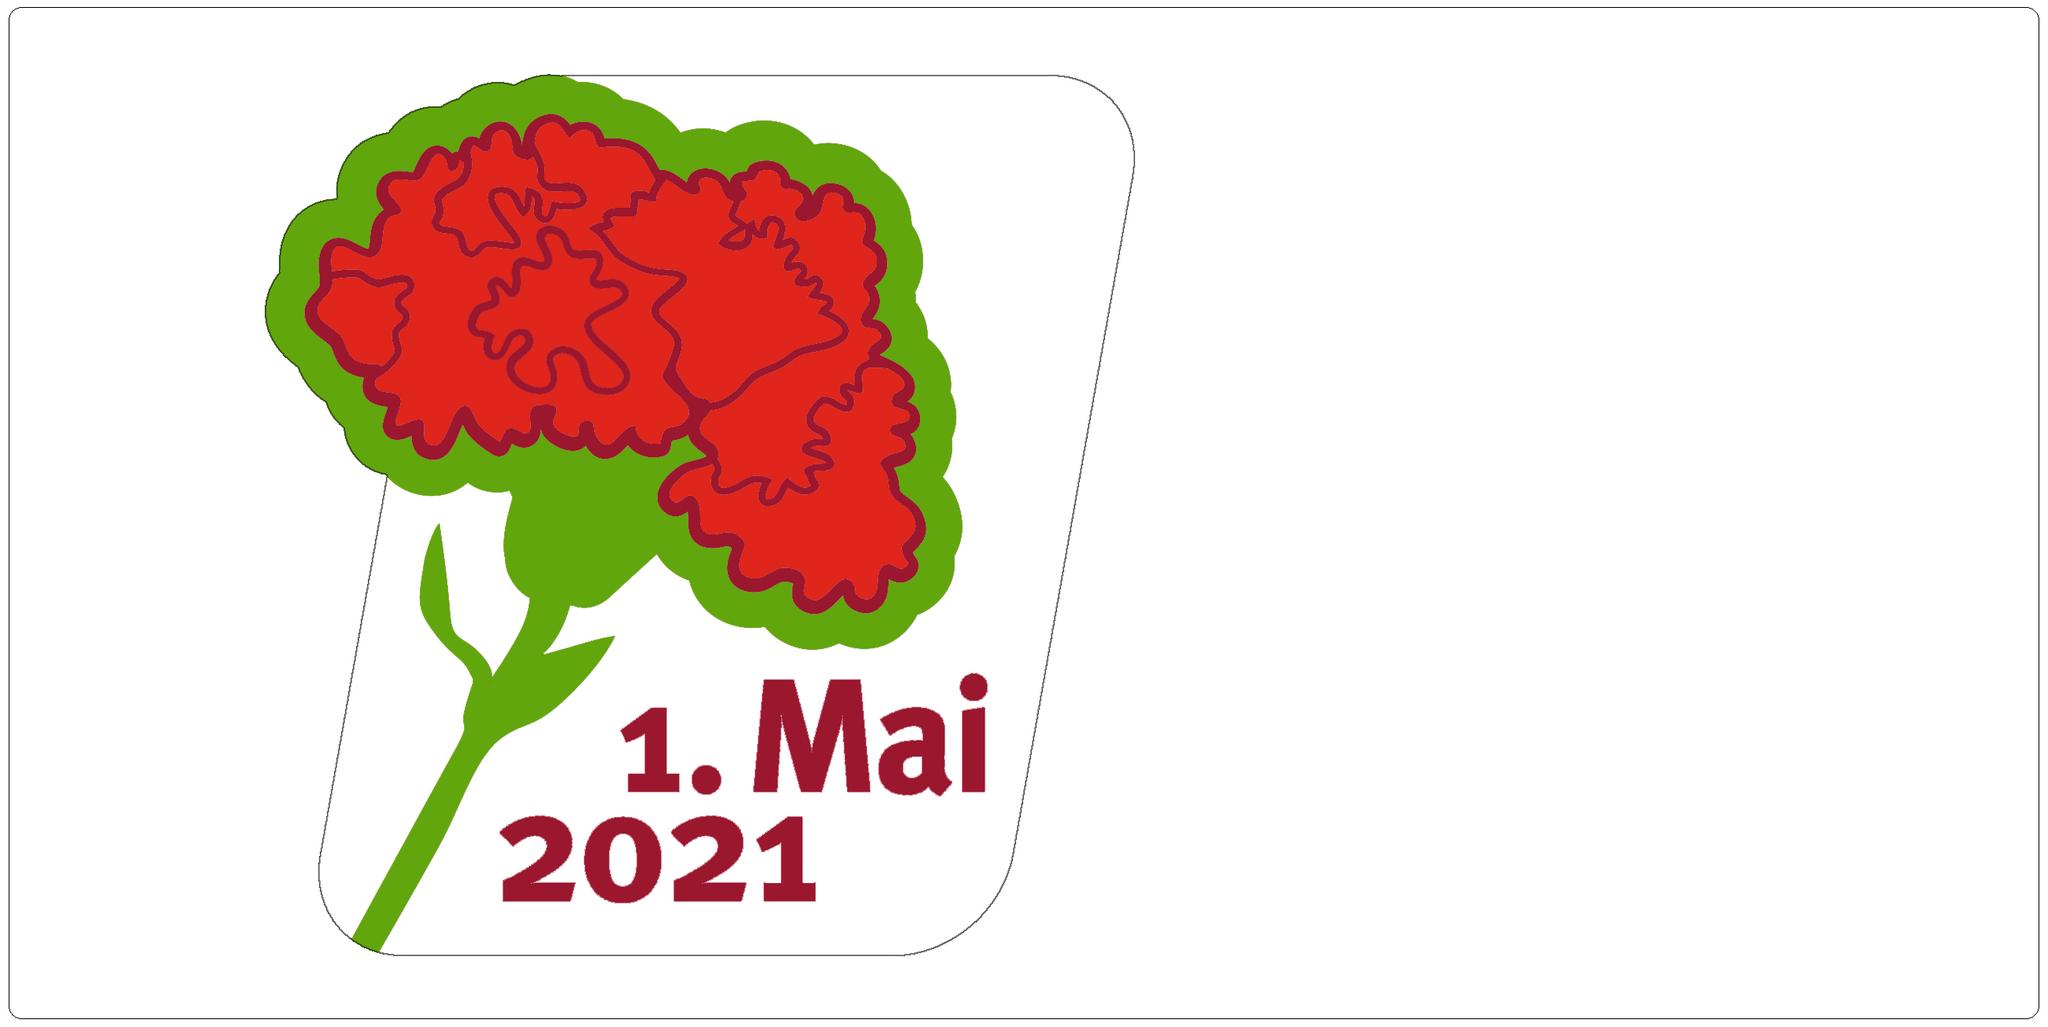 1. Mai-Nelke 1. Mai 2021 Tag der Arbeit